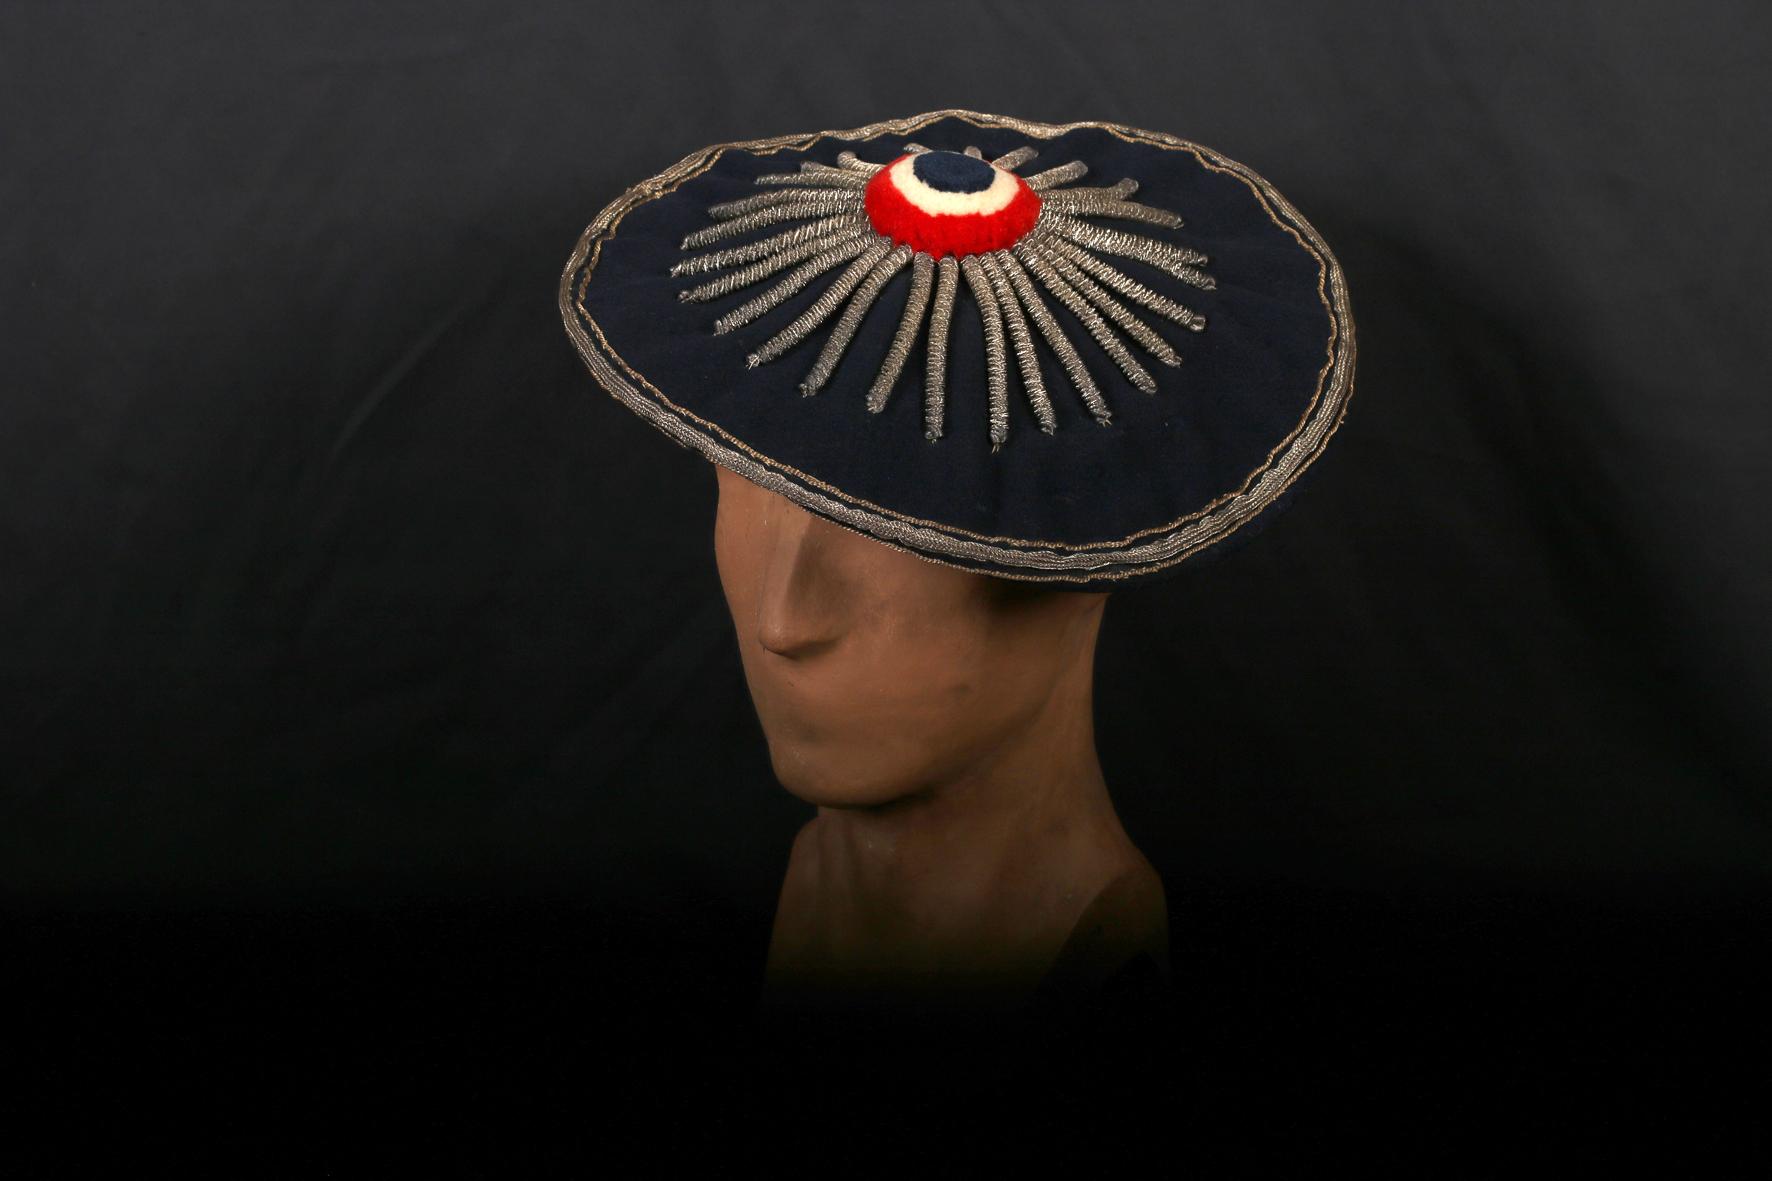 Béret du costume de garde national